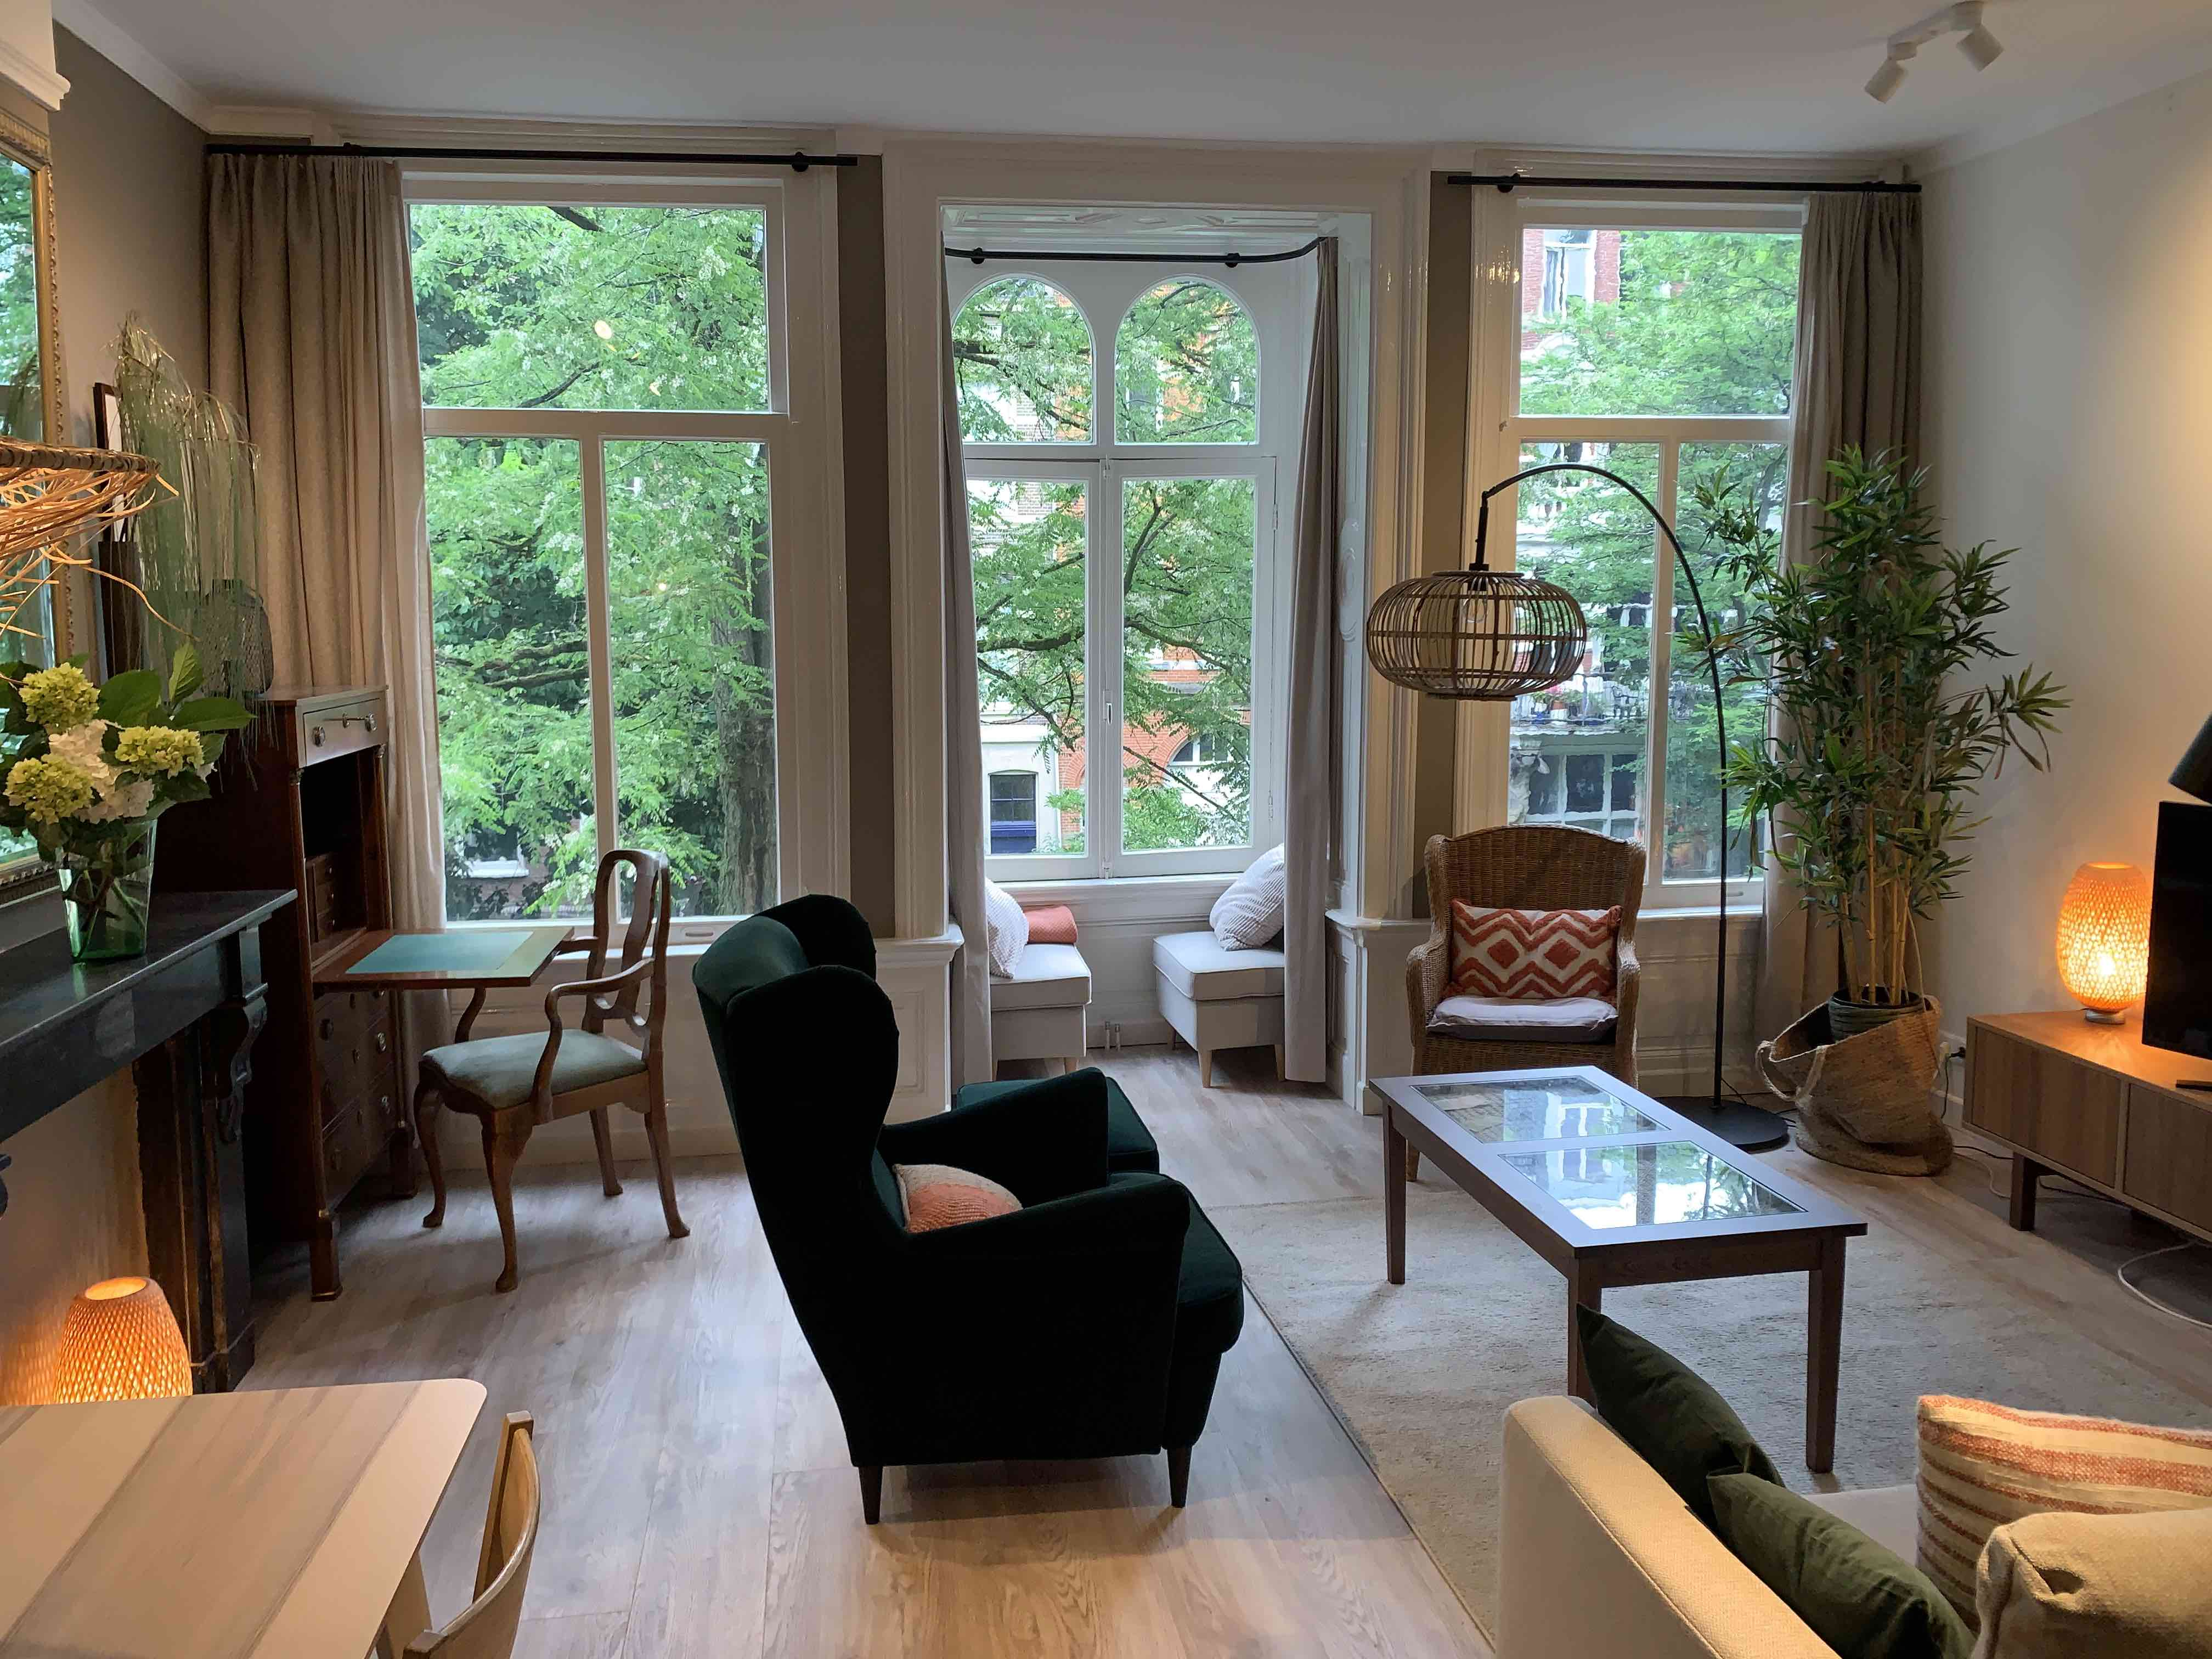 Henri Polaklaan, Amsterdam